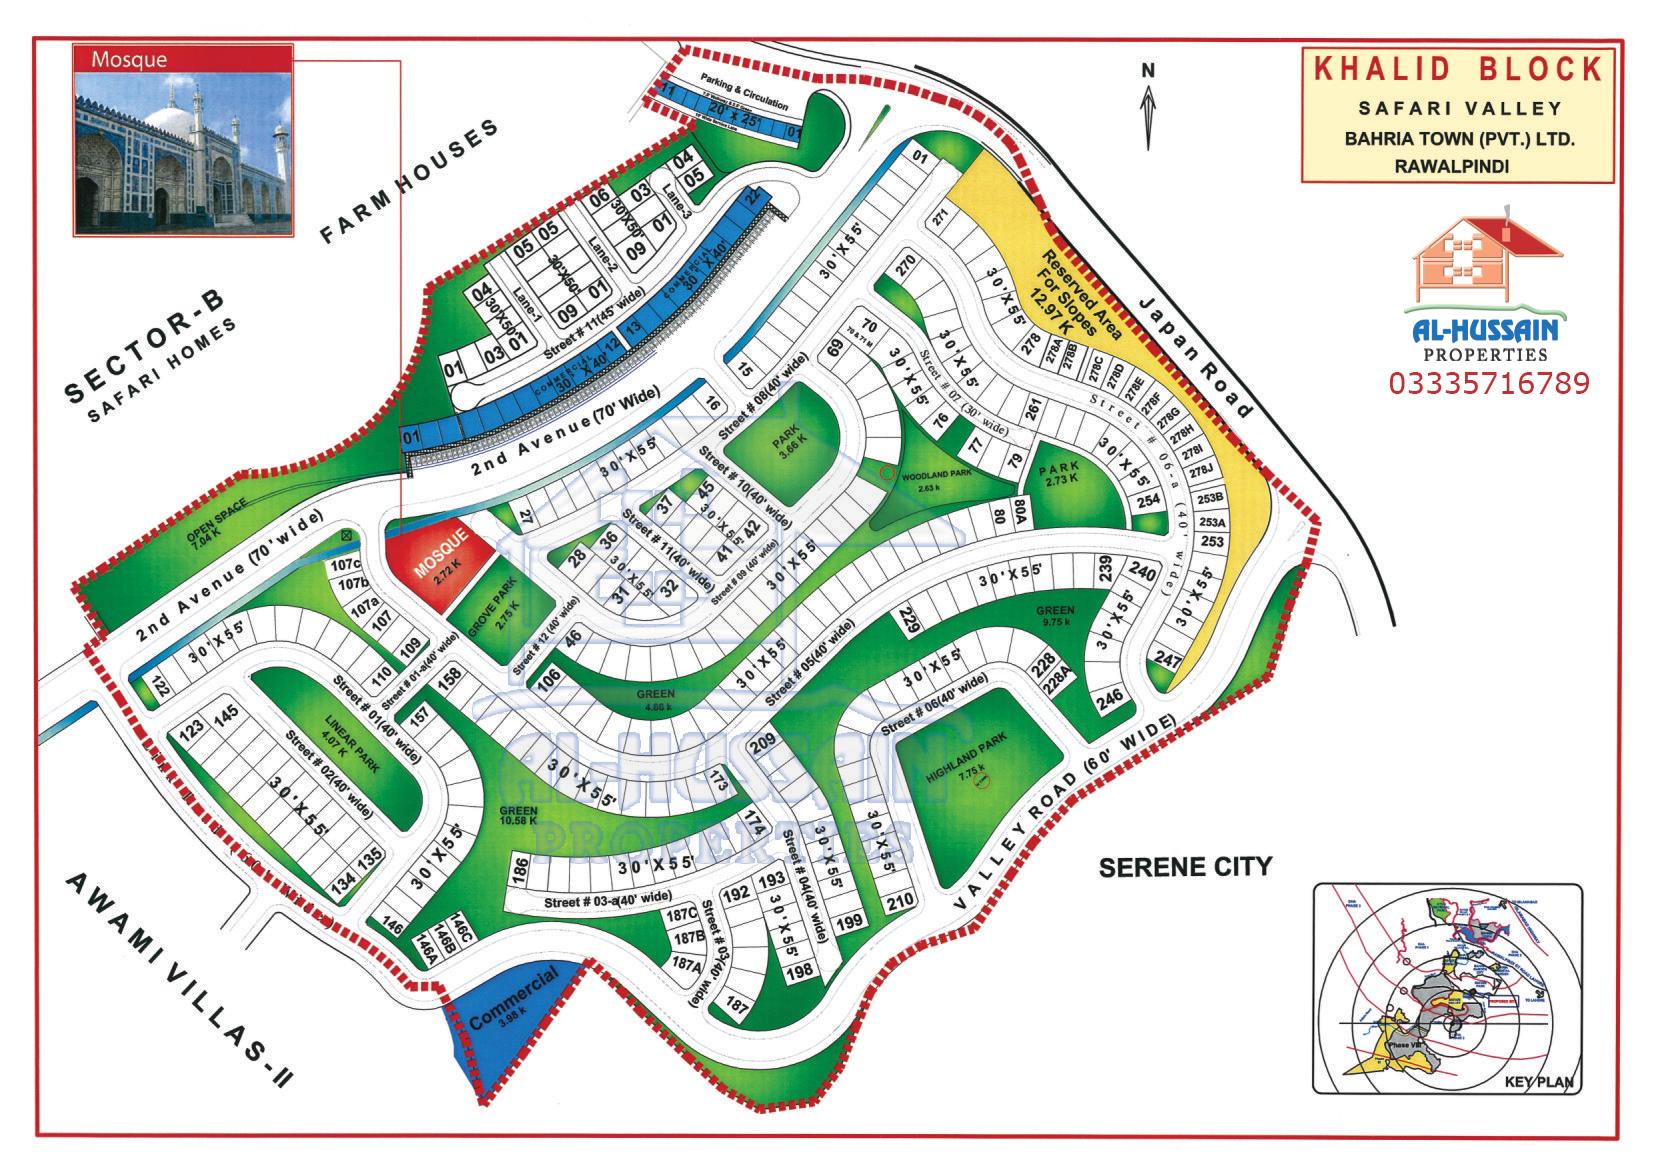 Khalid Block Safari Valley Bahria Town Rawalpindi